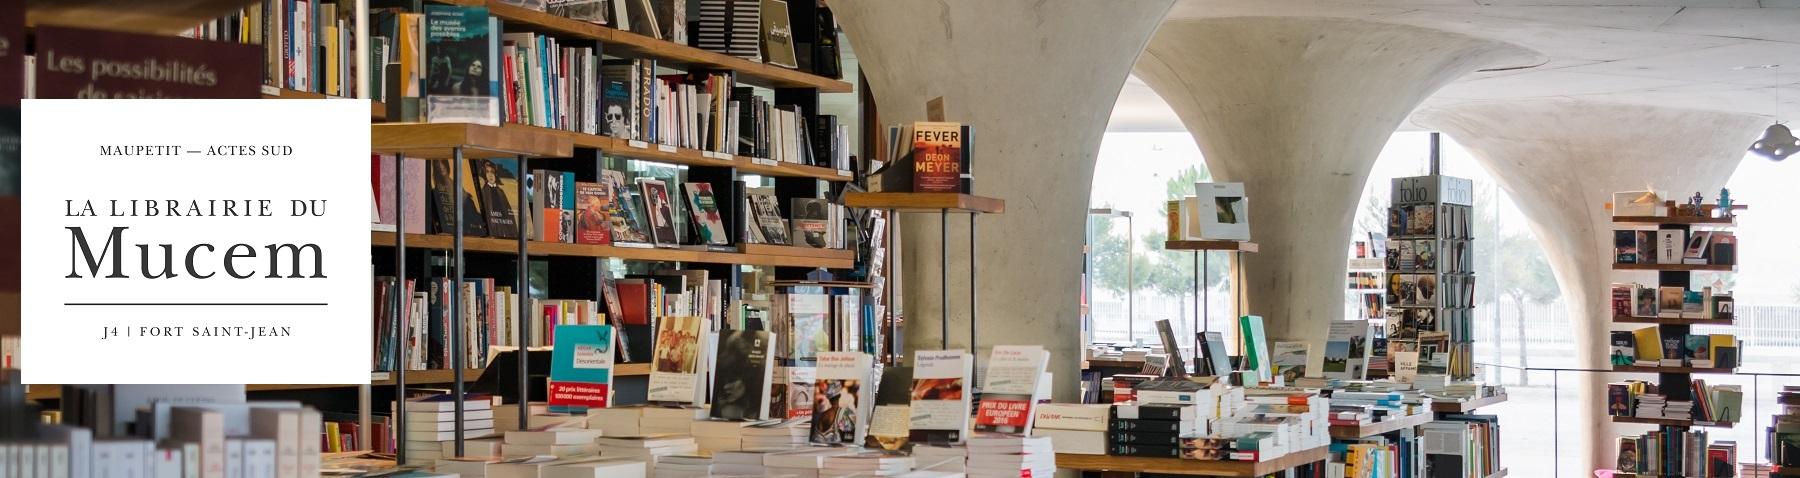 Librairie du Mucem